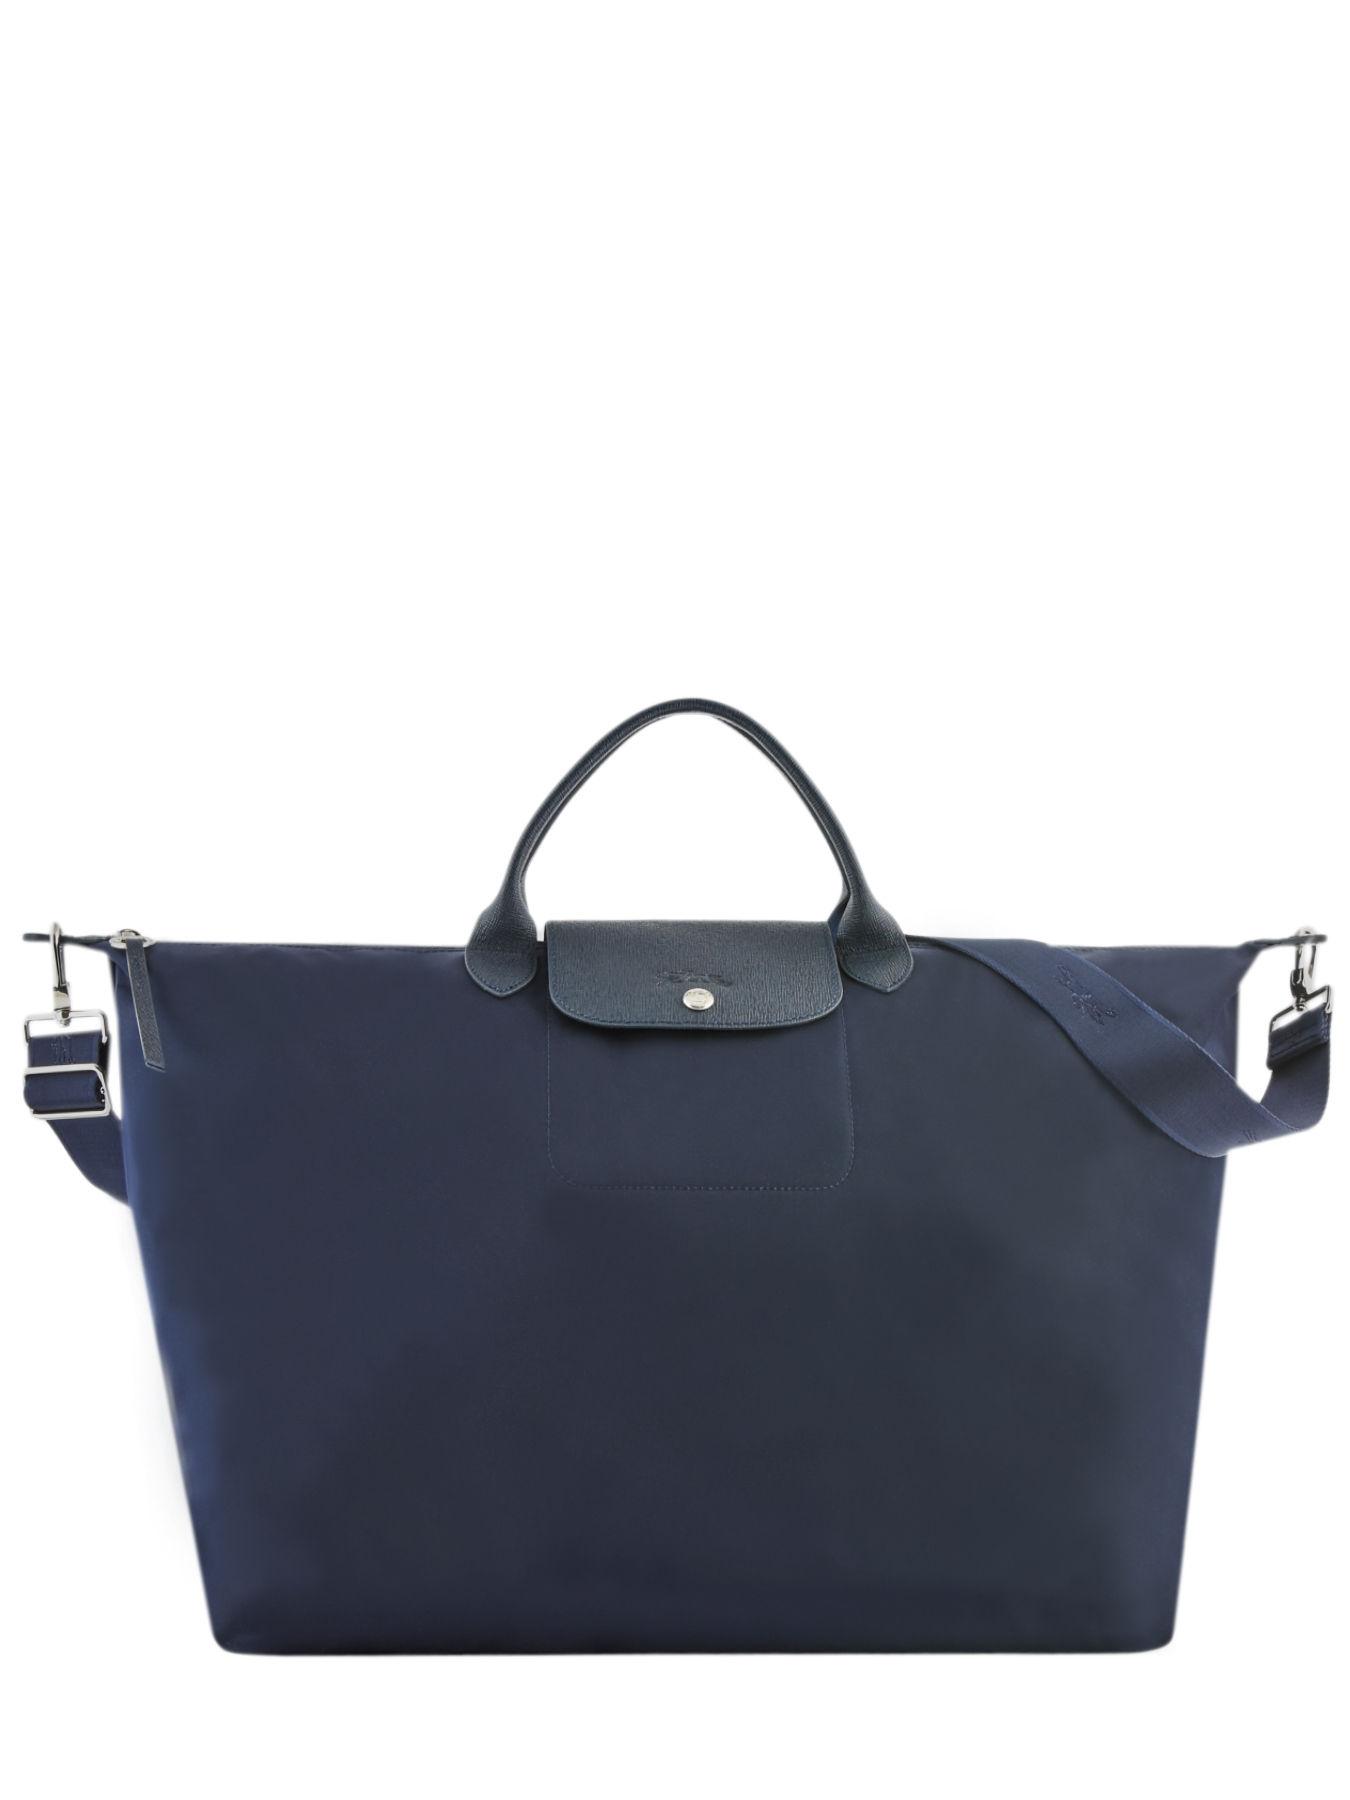 Travel bag LONGCHAMP